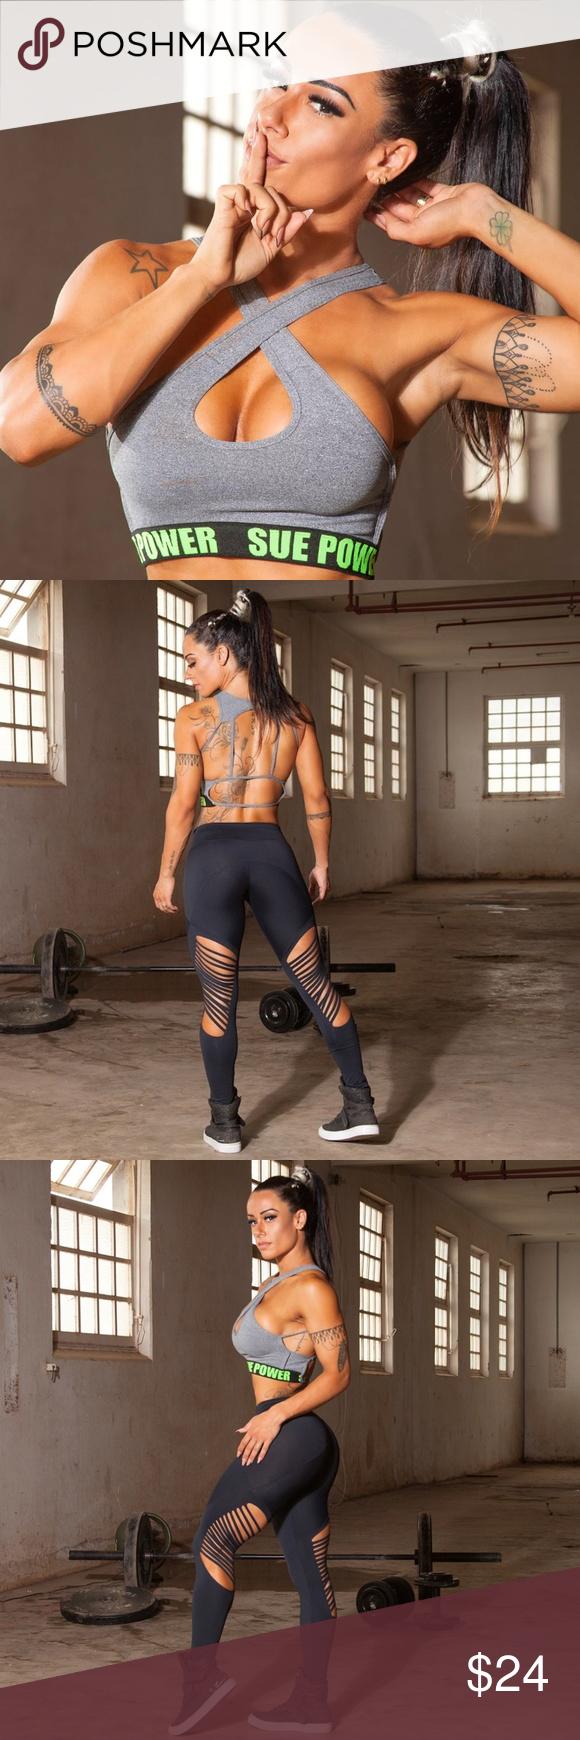 Brazilian Supplex Sports Bra Womens Athletic Wear Boutique